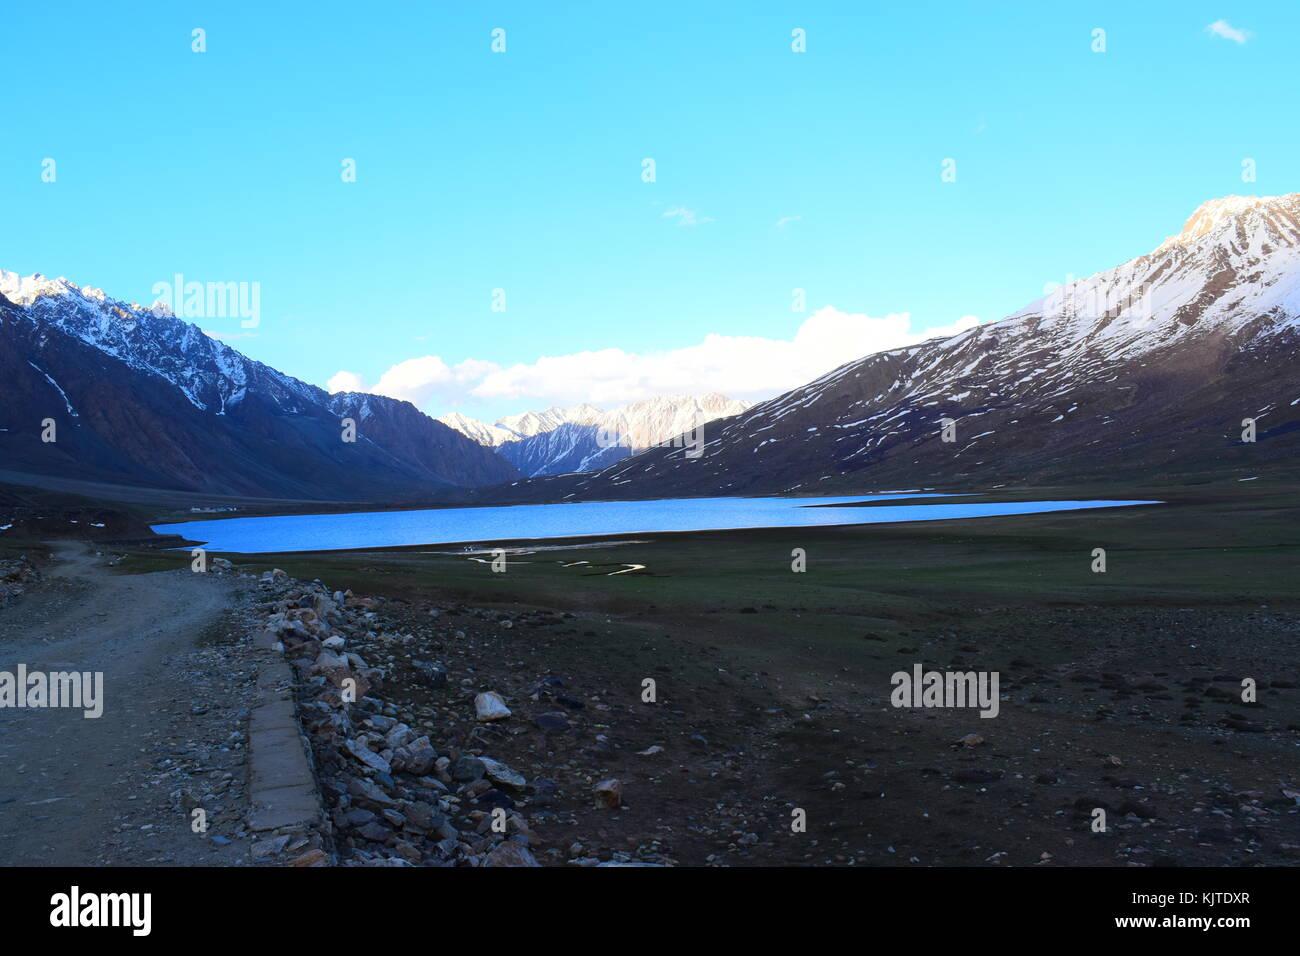 Beautiful view of Shandur Lake near the worlds highest polo ground in Shandur Top, Chitral, KPK, Pakistan - Stock Image